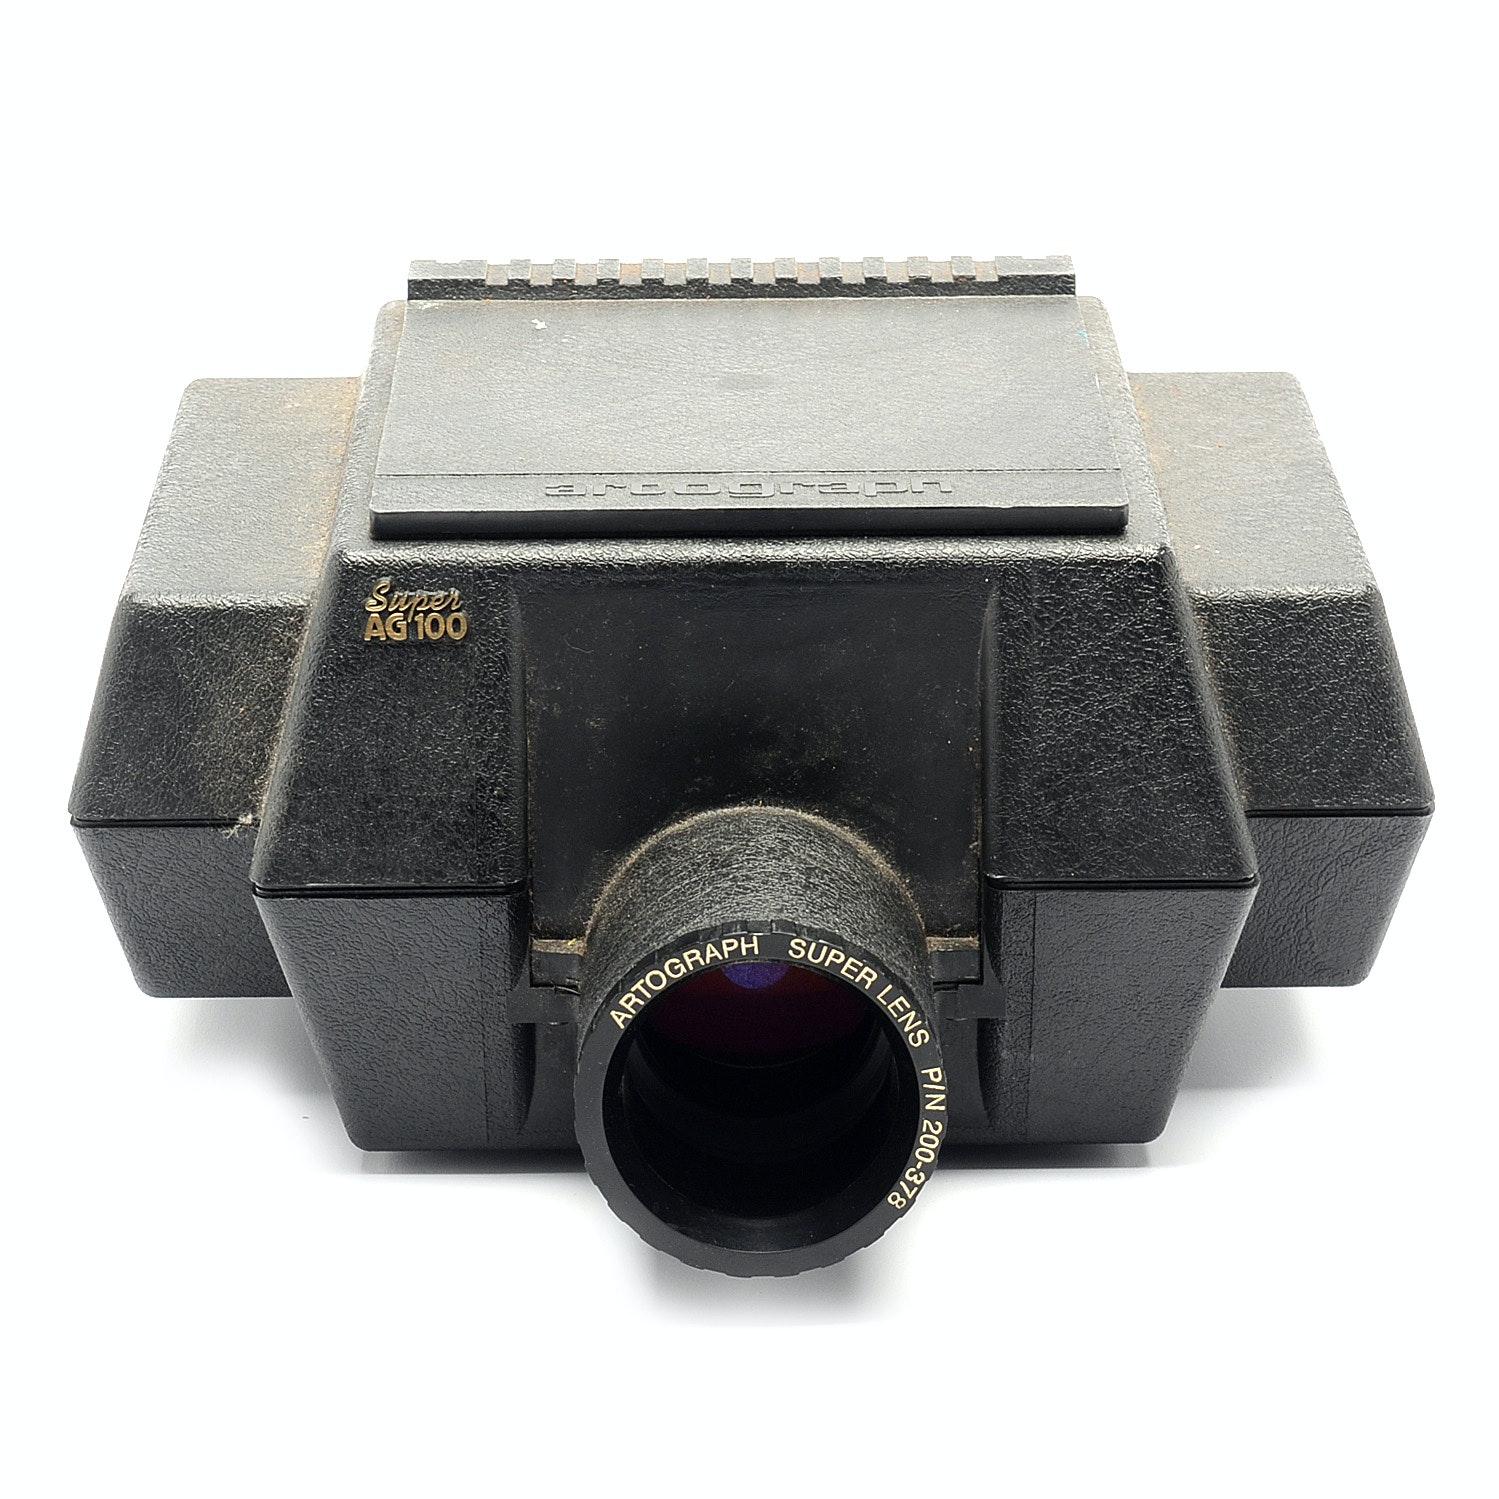 Artograph Super AG100 Image Projector